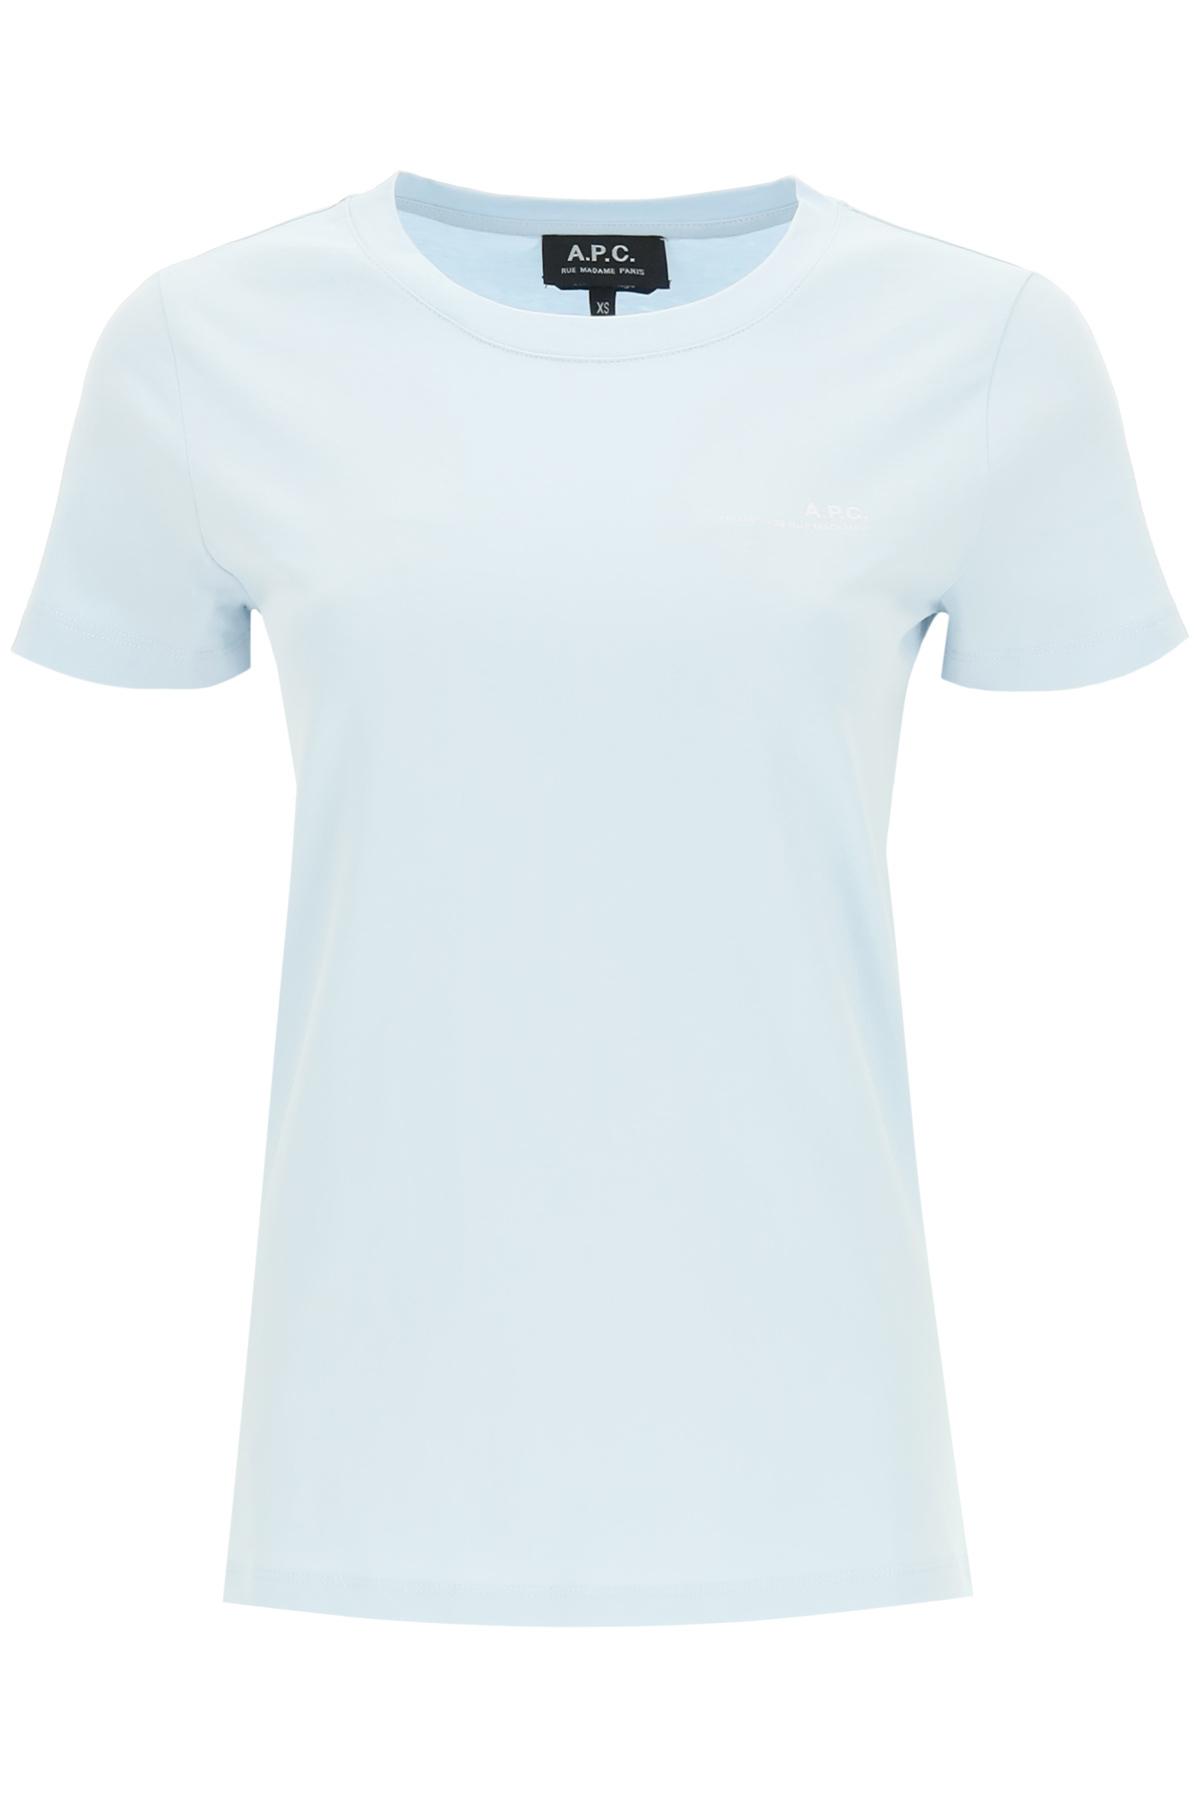 A.P.C. ITEM 001 T-SHIRT WITH LOGO PRINT M Light blue, White Cotton